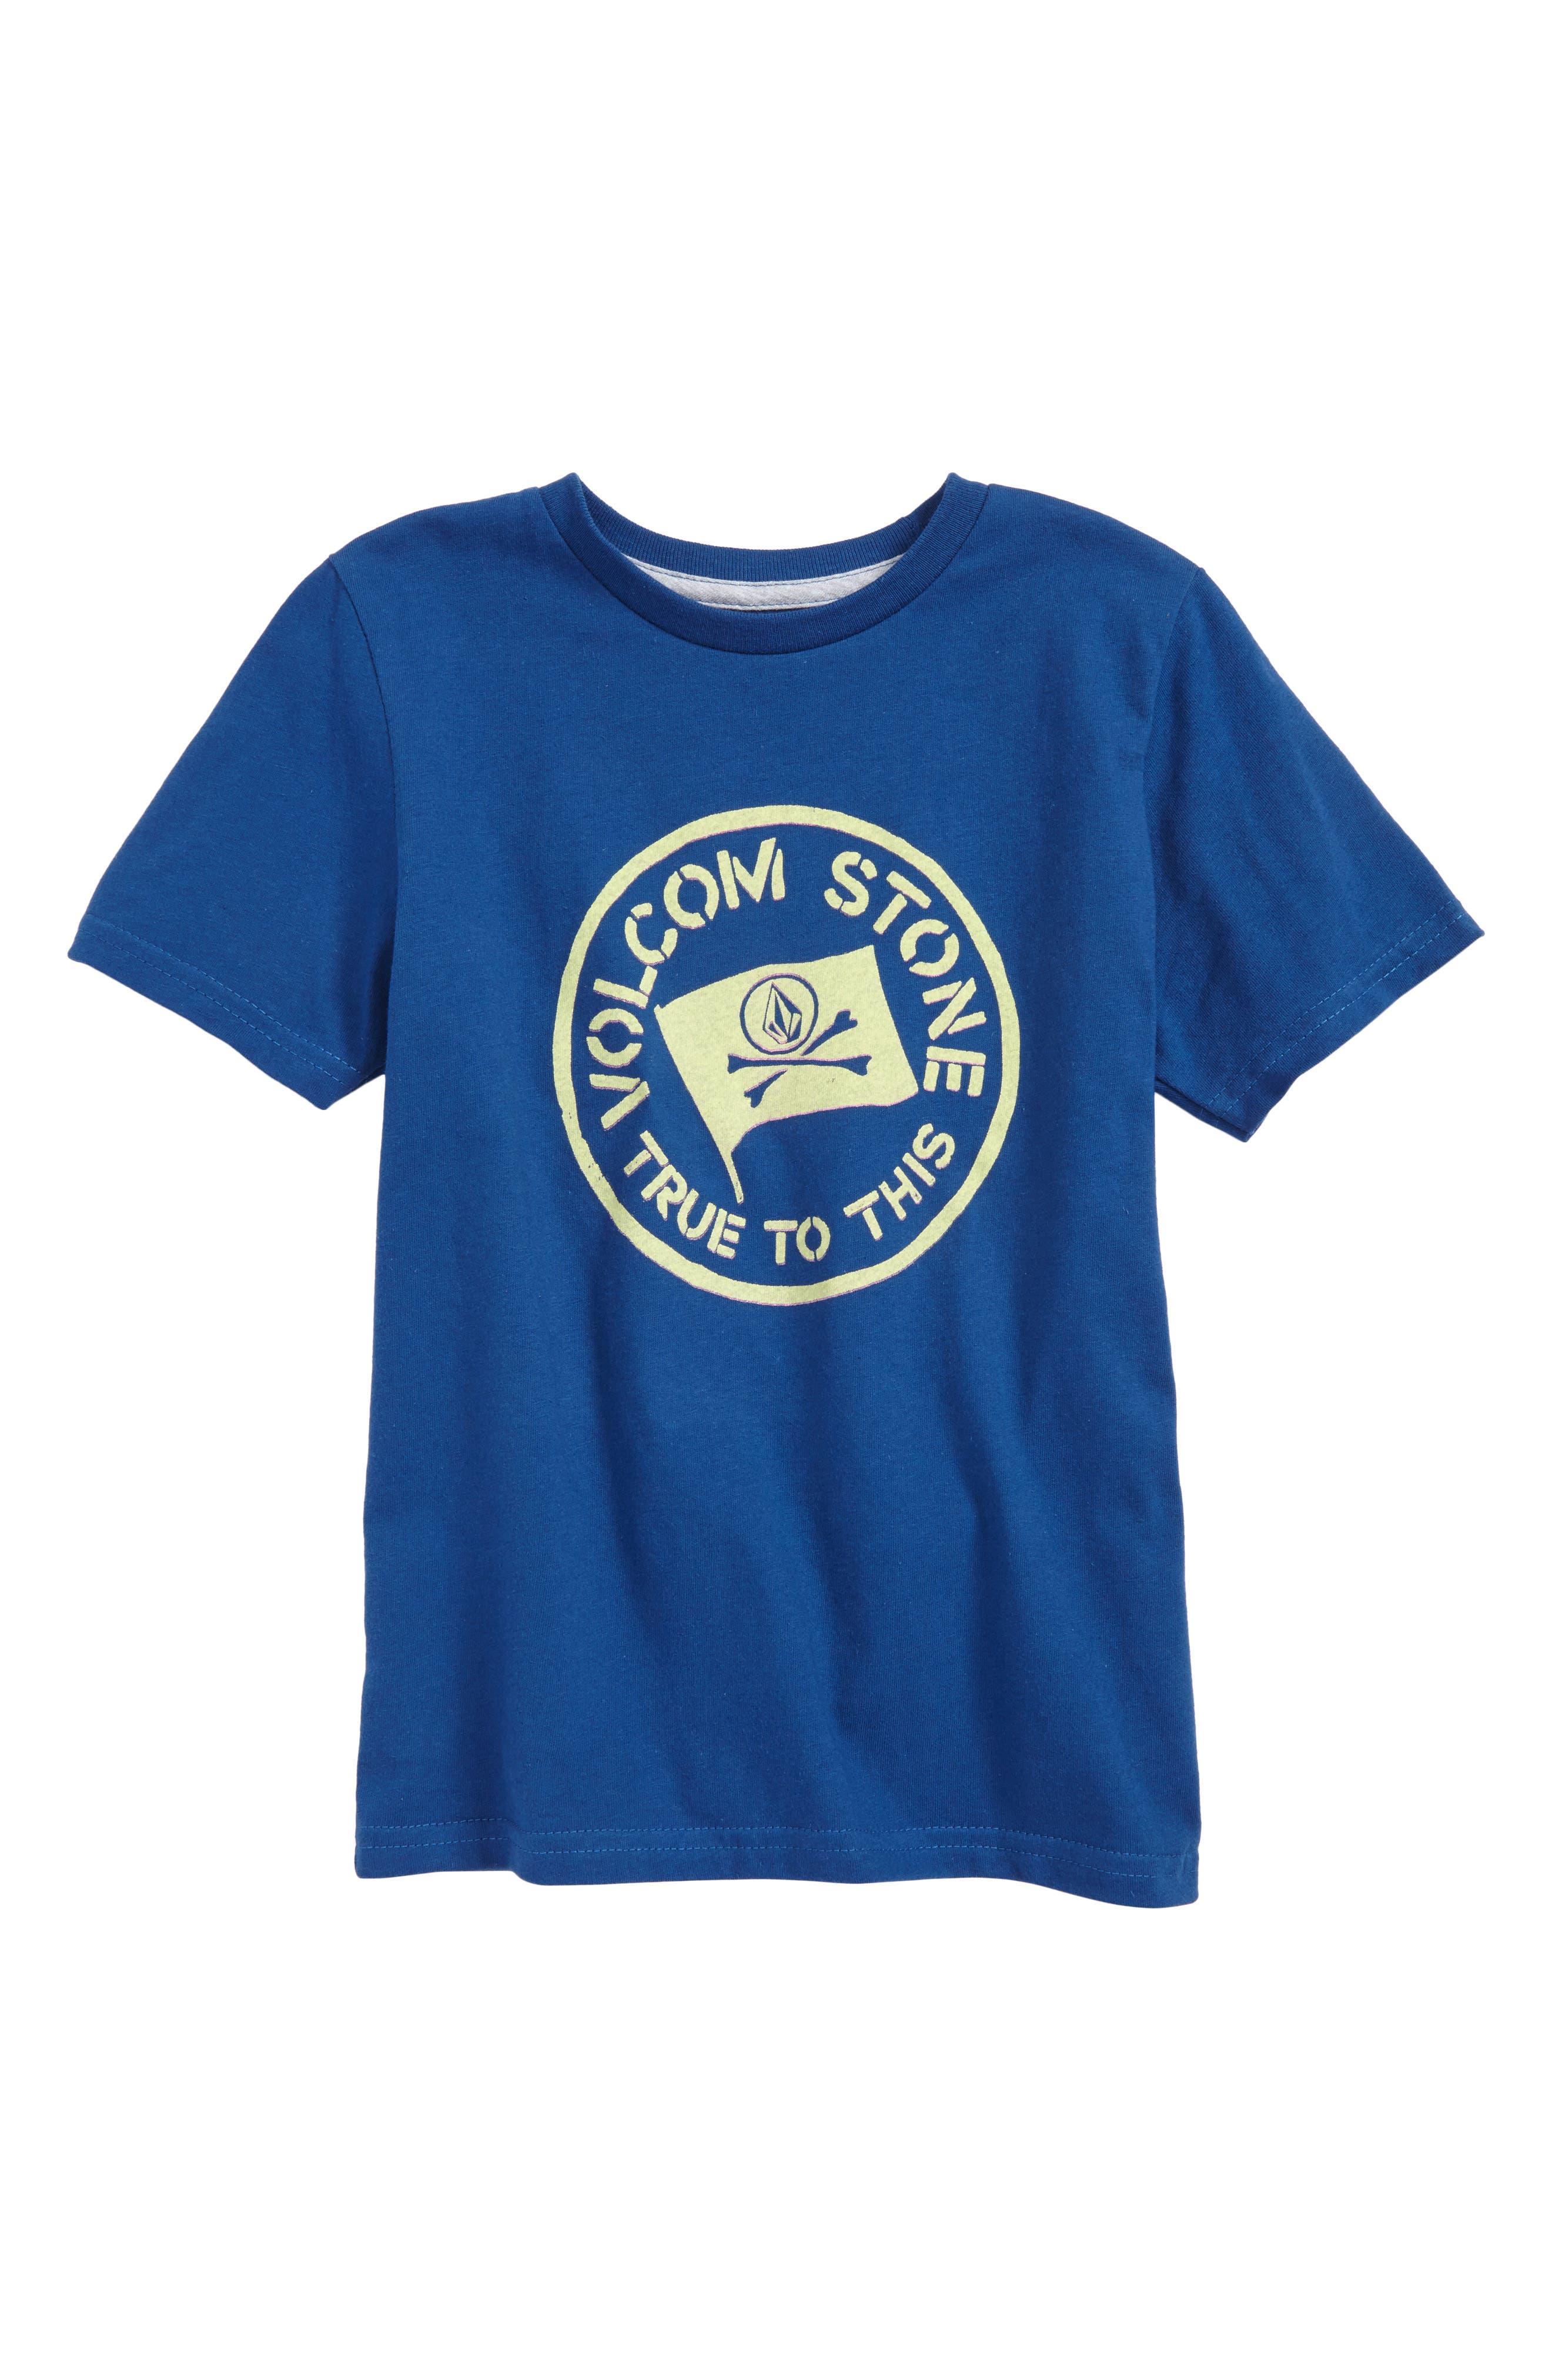 Jolly Rebel T-Shirt,                         Main,                         color, Camper Blue